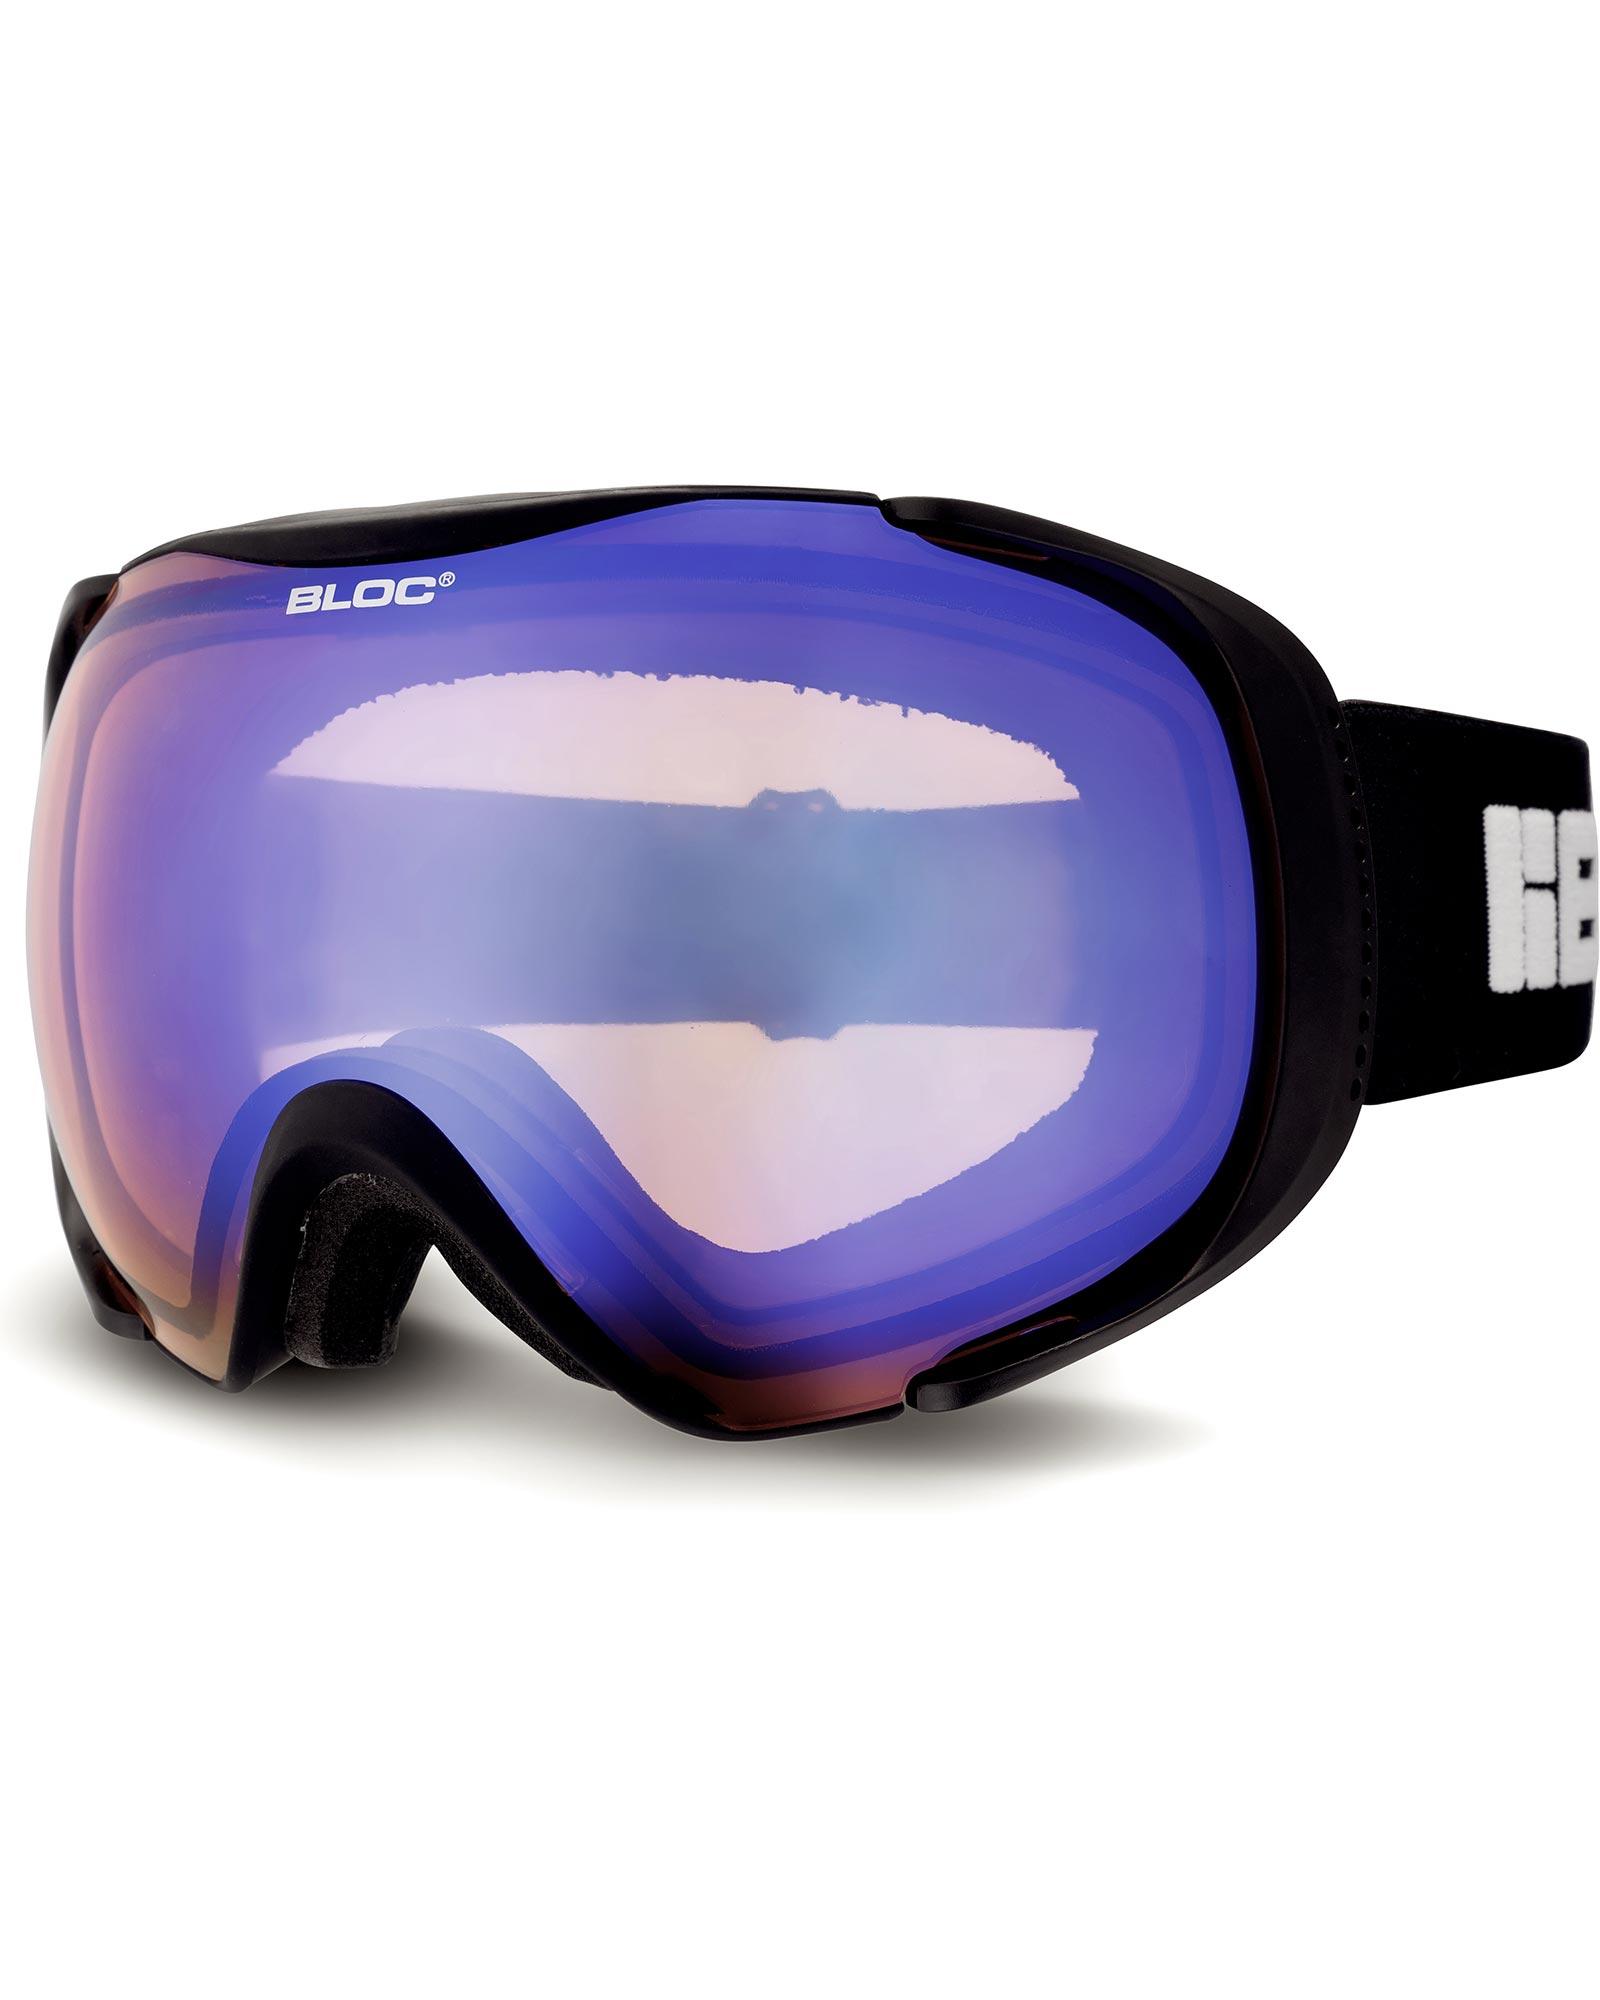 Bloc Mask OTG Matte Black / Brown Blue Mirror Goggles 2020 / 2021 0